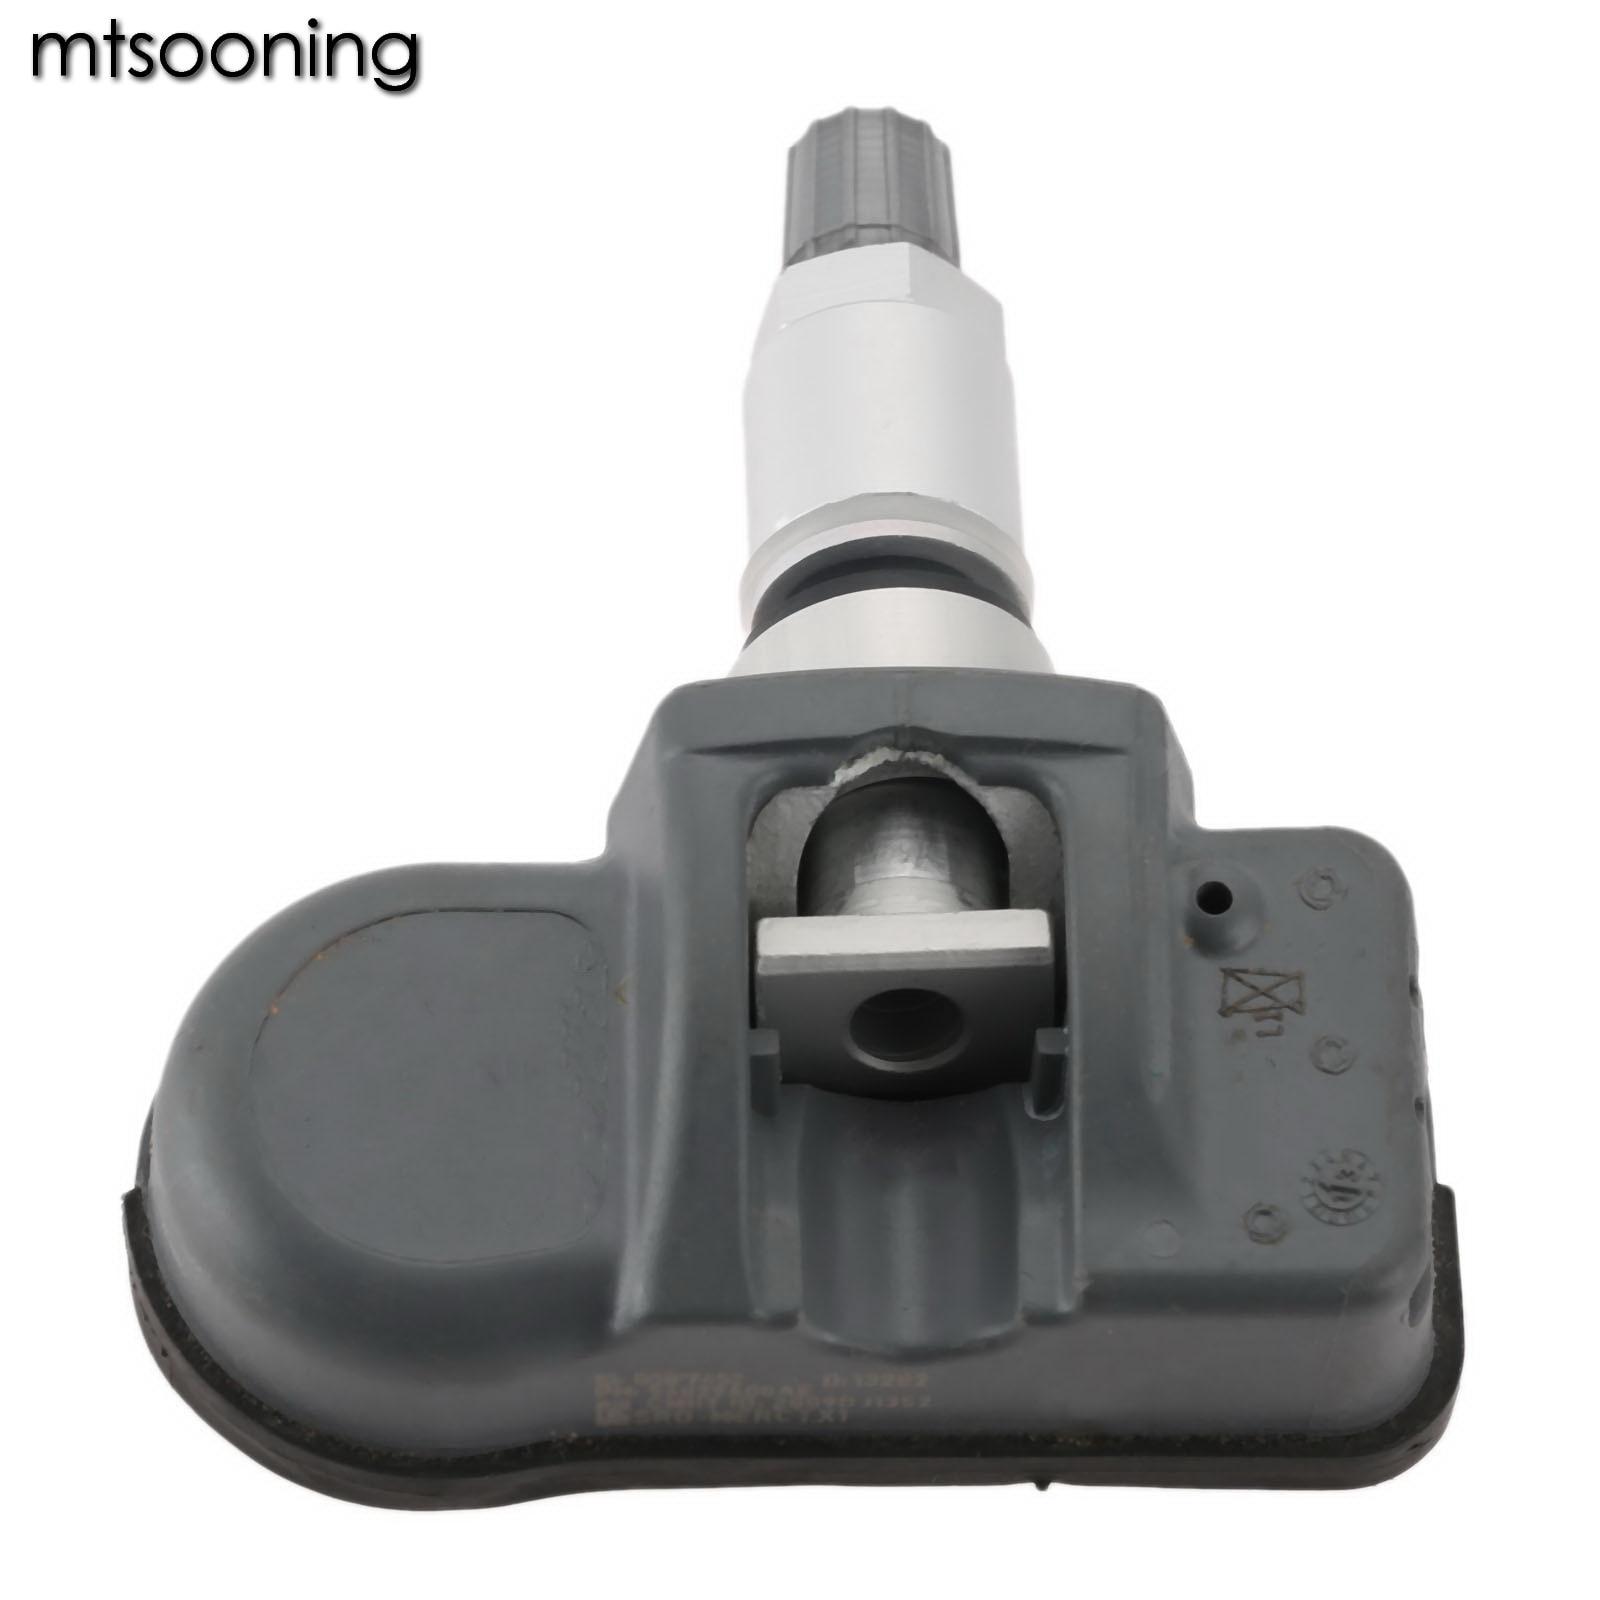 4X TPMS Tire Pressure Sensor For Mercedes Chrysler Dodge Jeep 56029400AE 433MHz